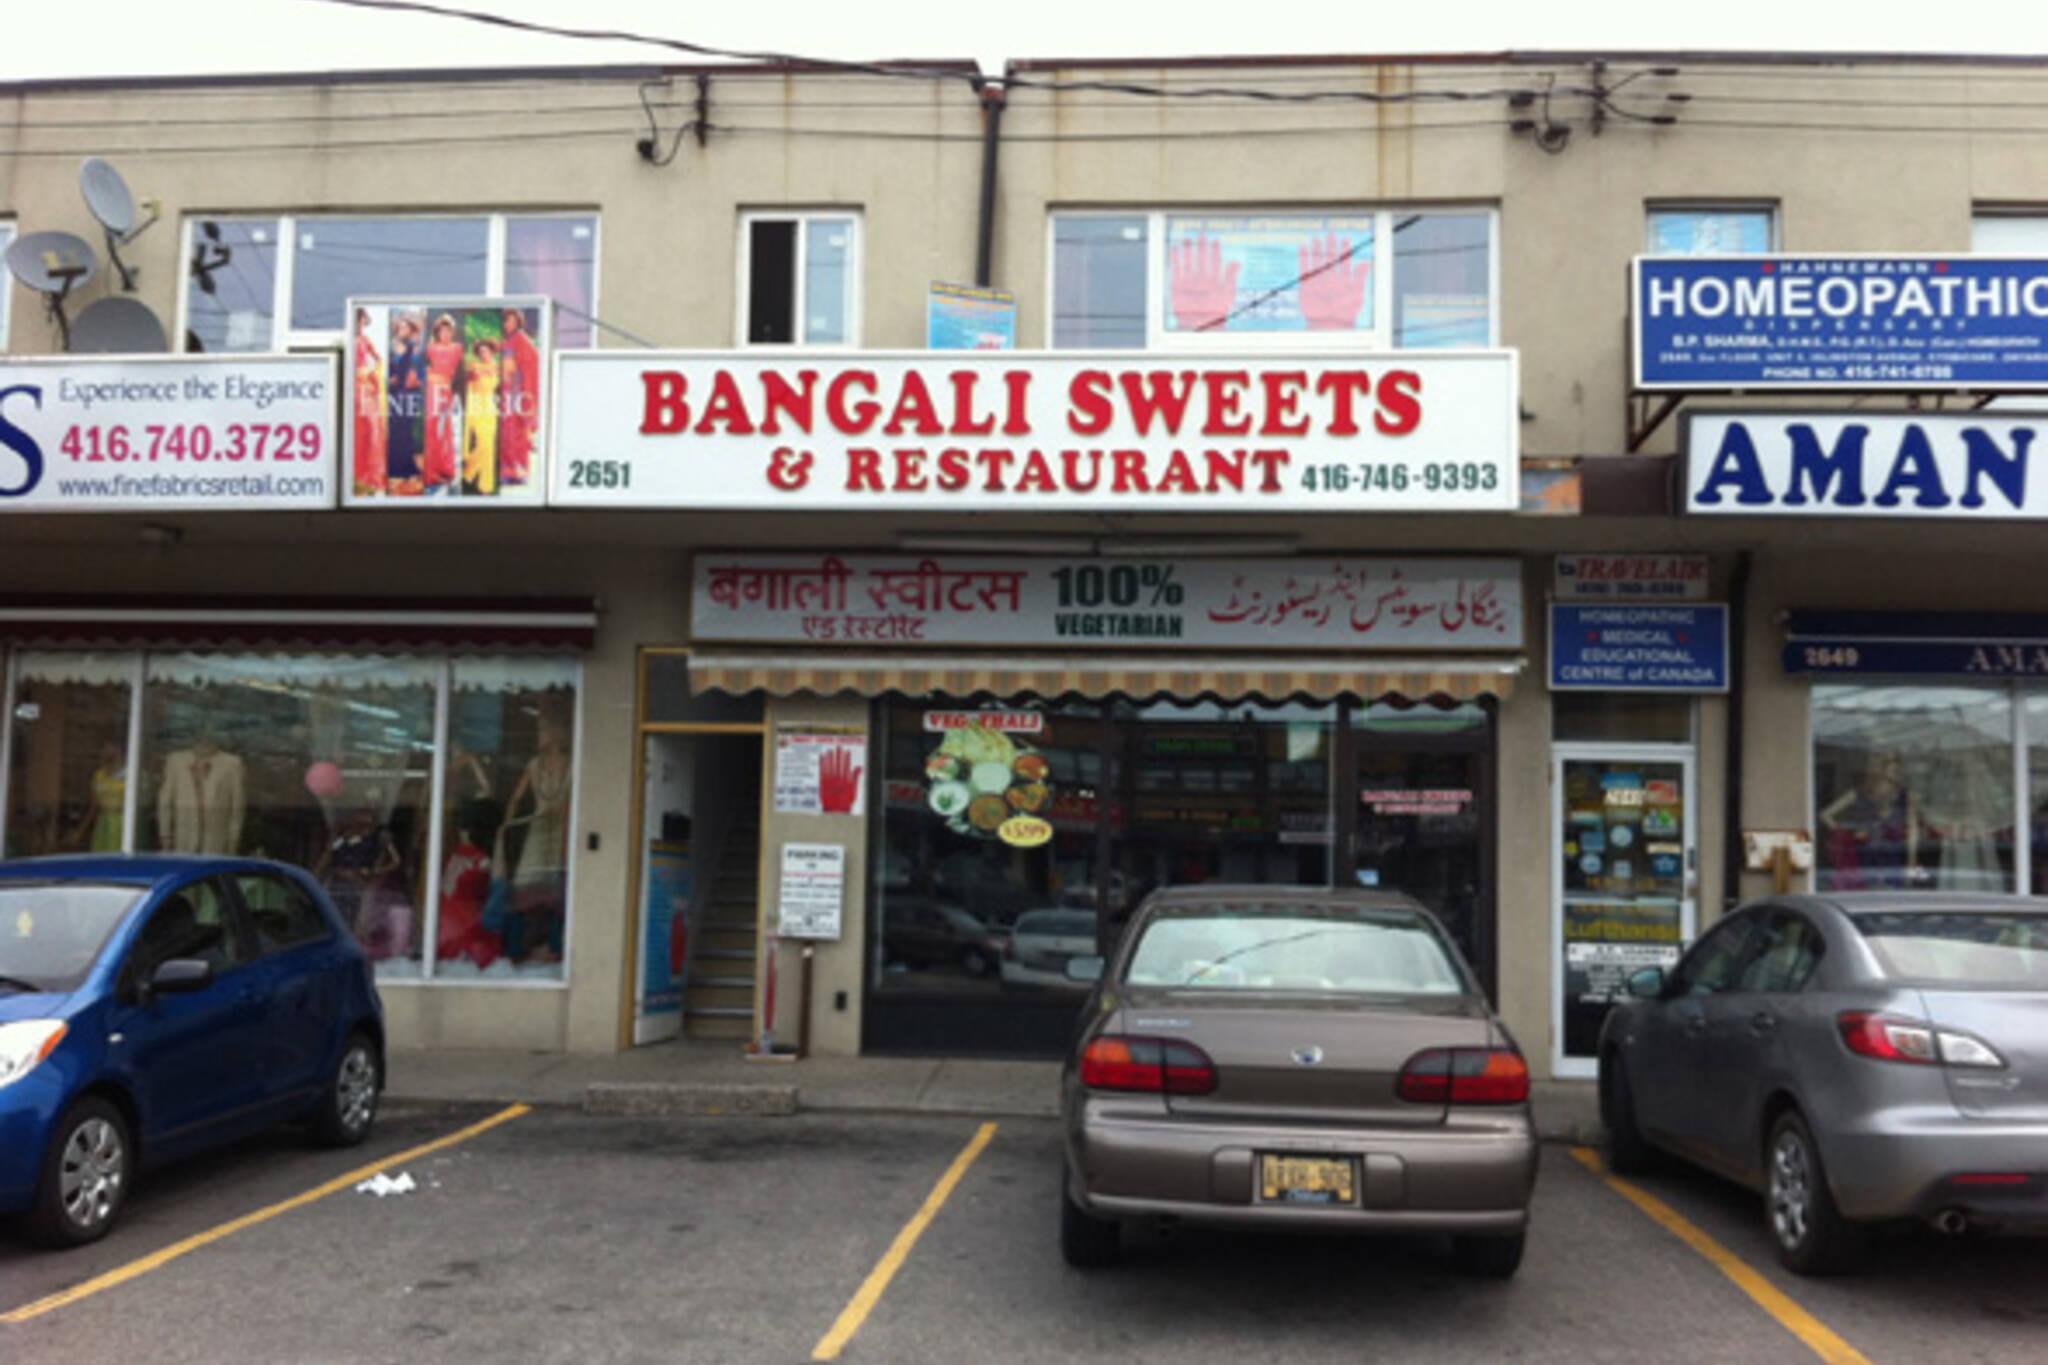 Bangali Sweets